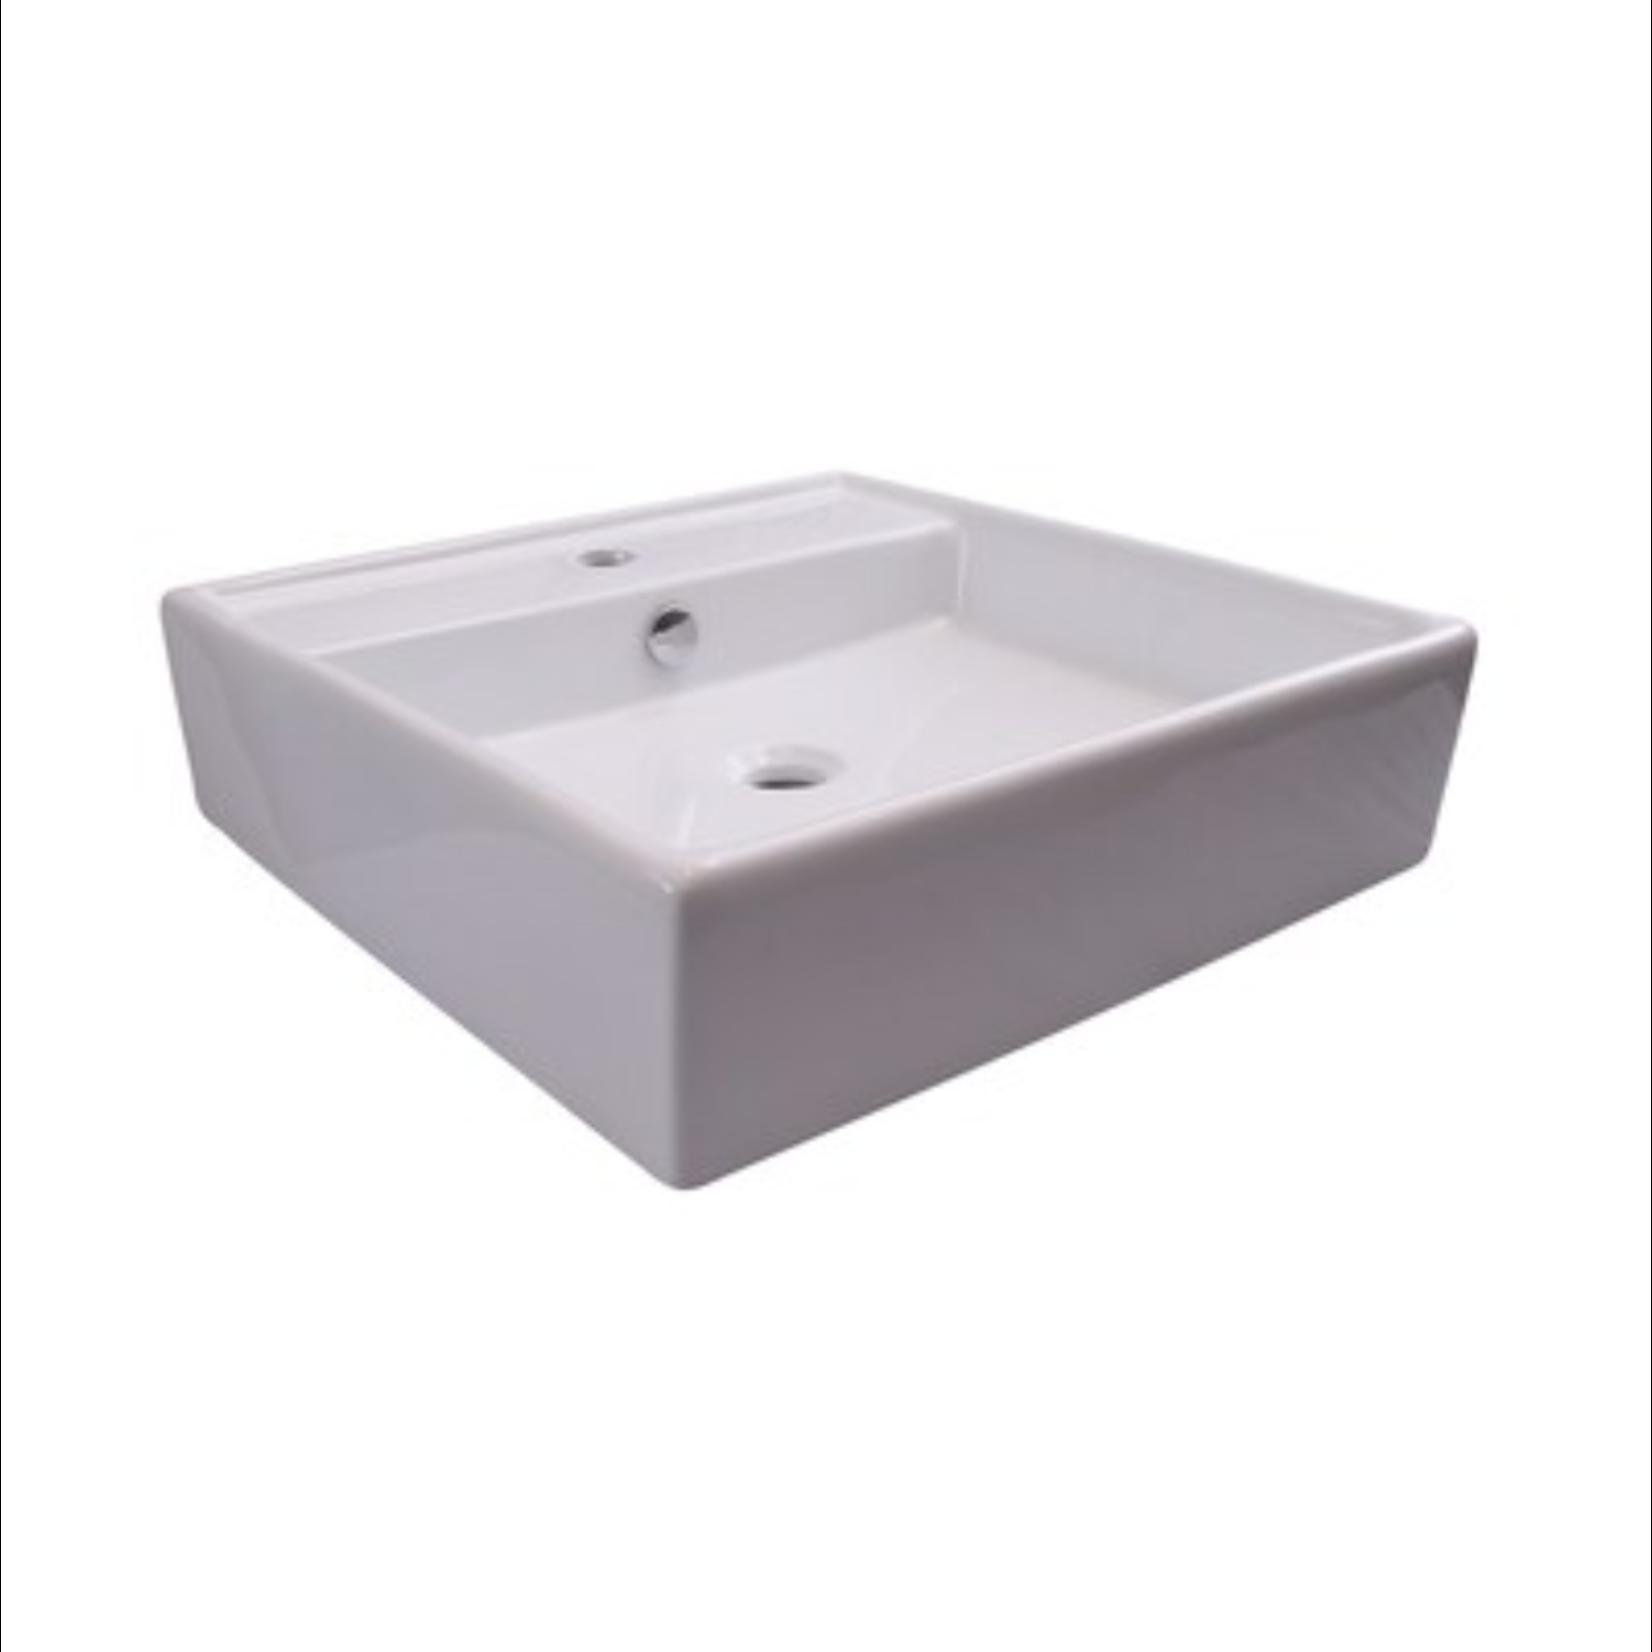 10099 Barclay Markle White Basin Wall-Hung Bathroom Sink